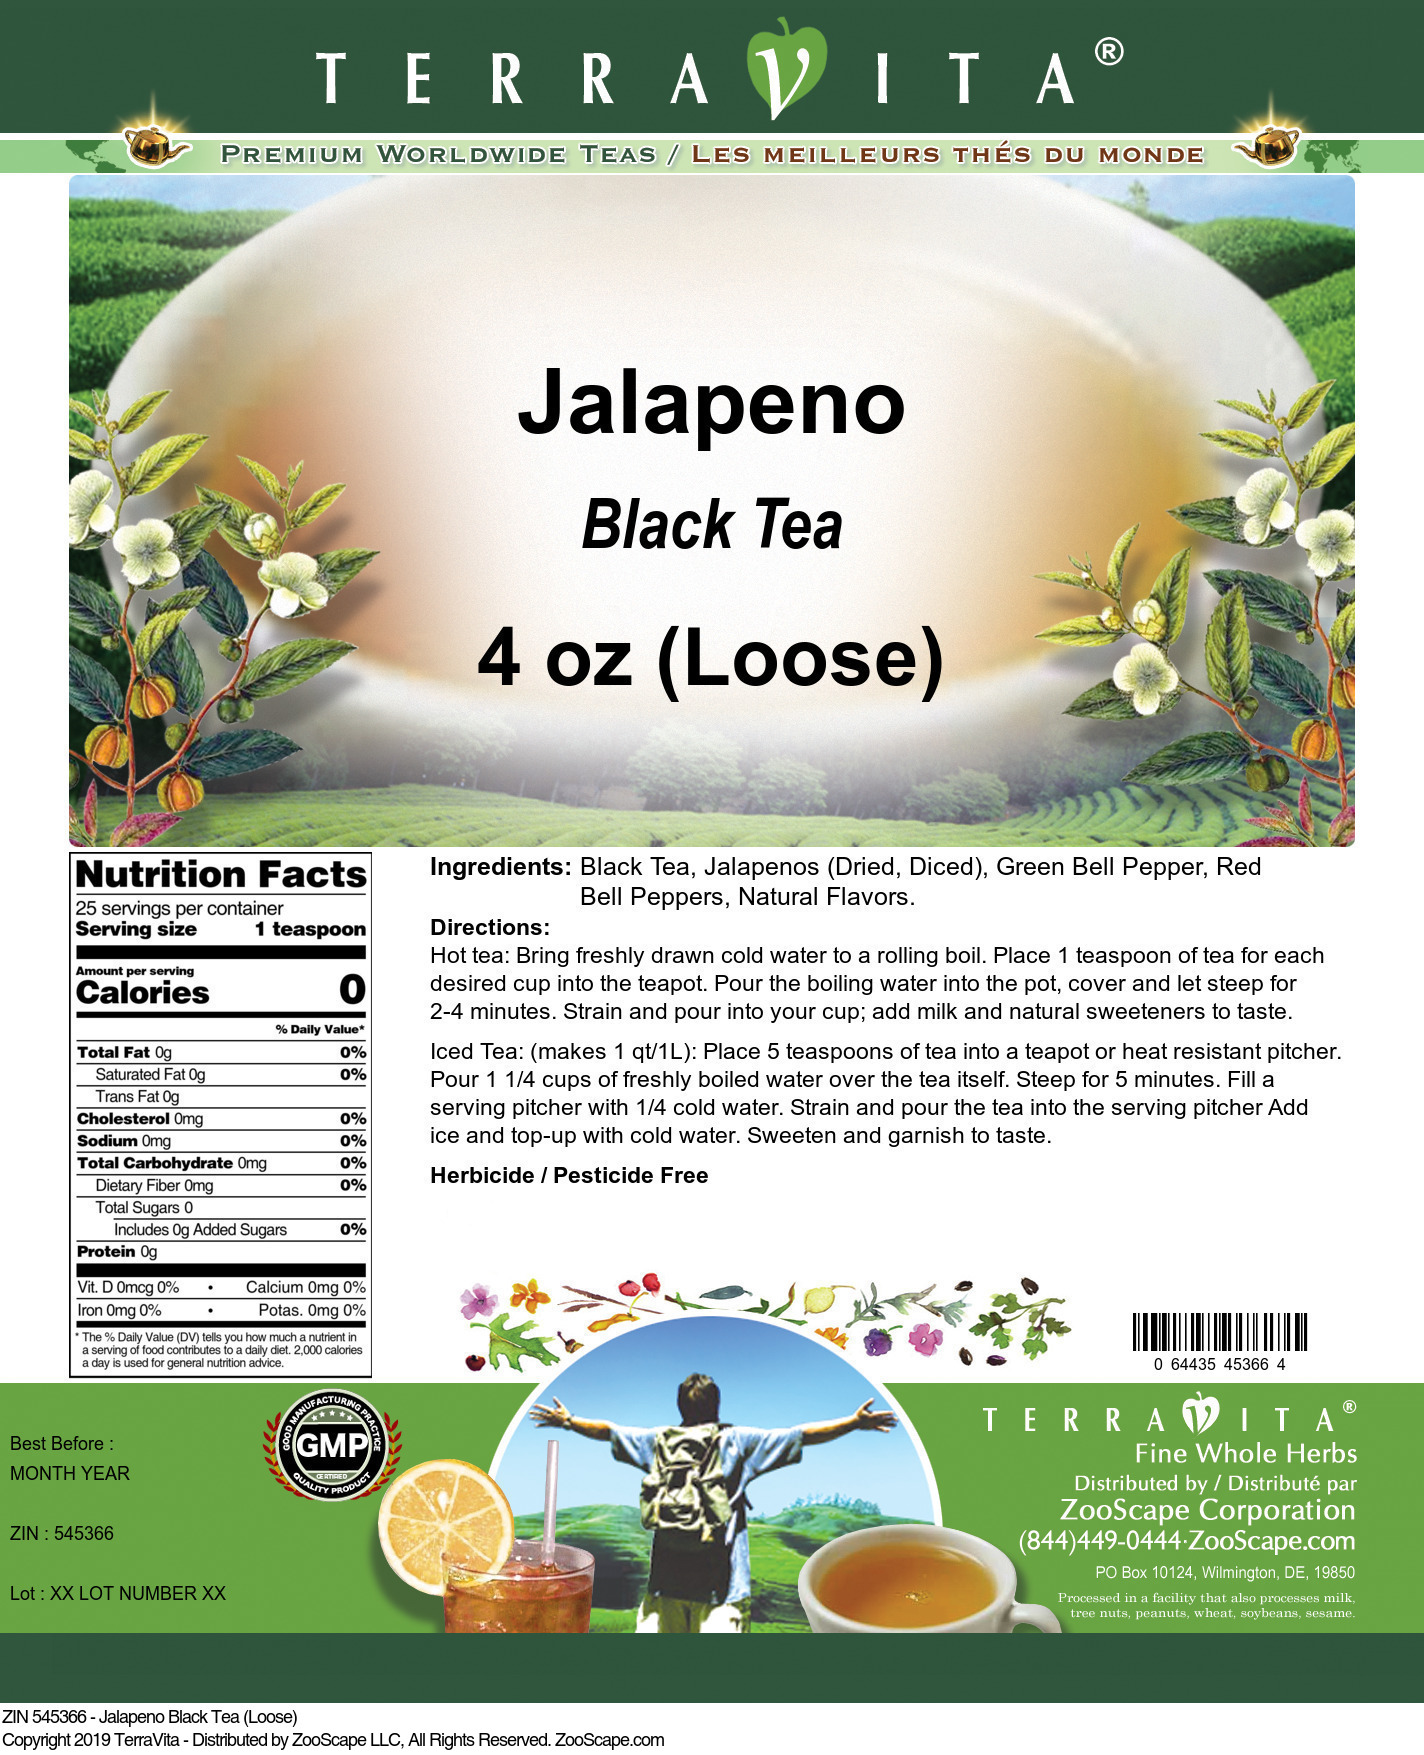 Jalapeno Black Tea (Loose)